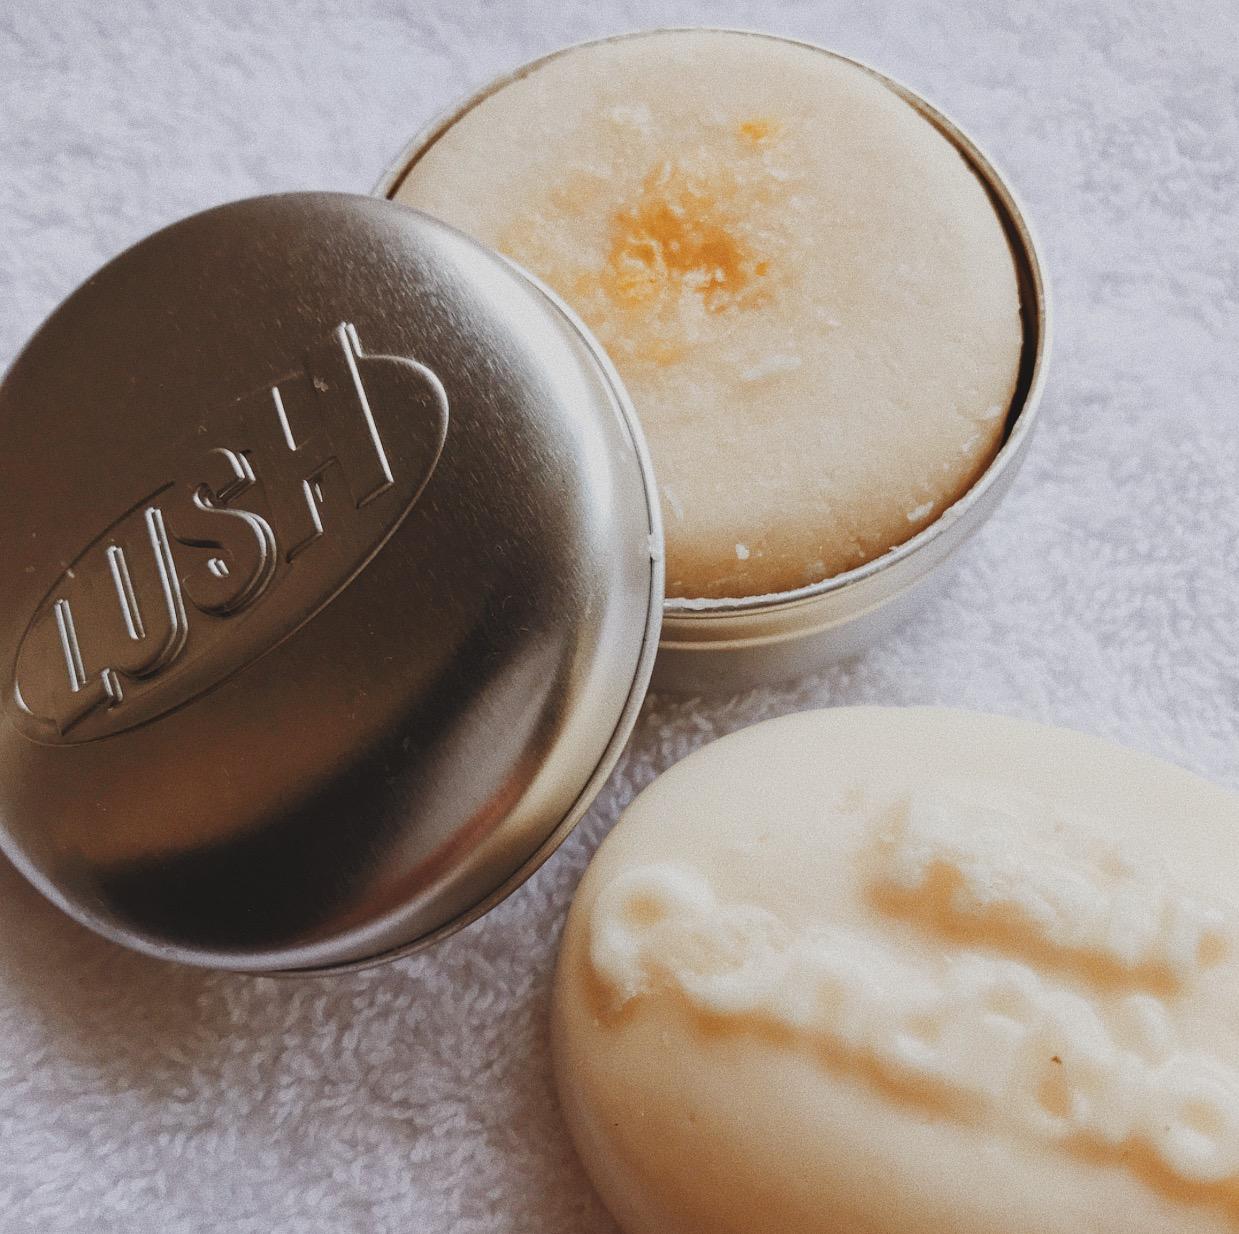 Lush Shampoo and Conditioner bar